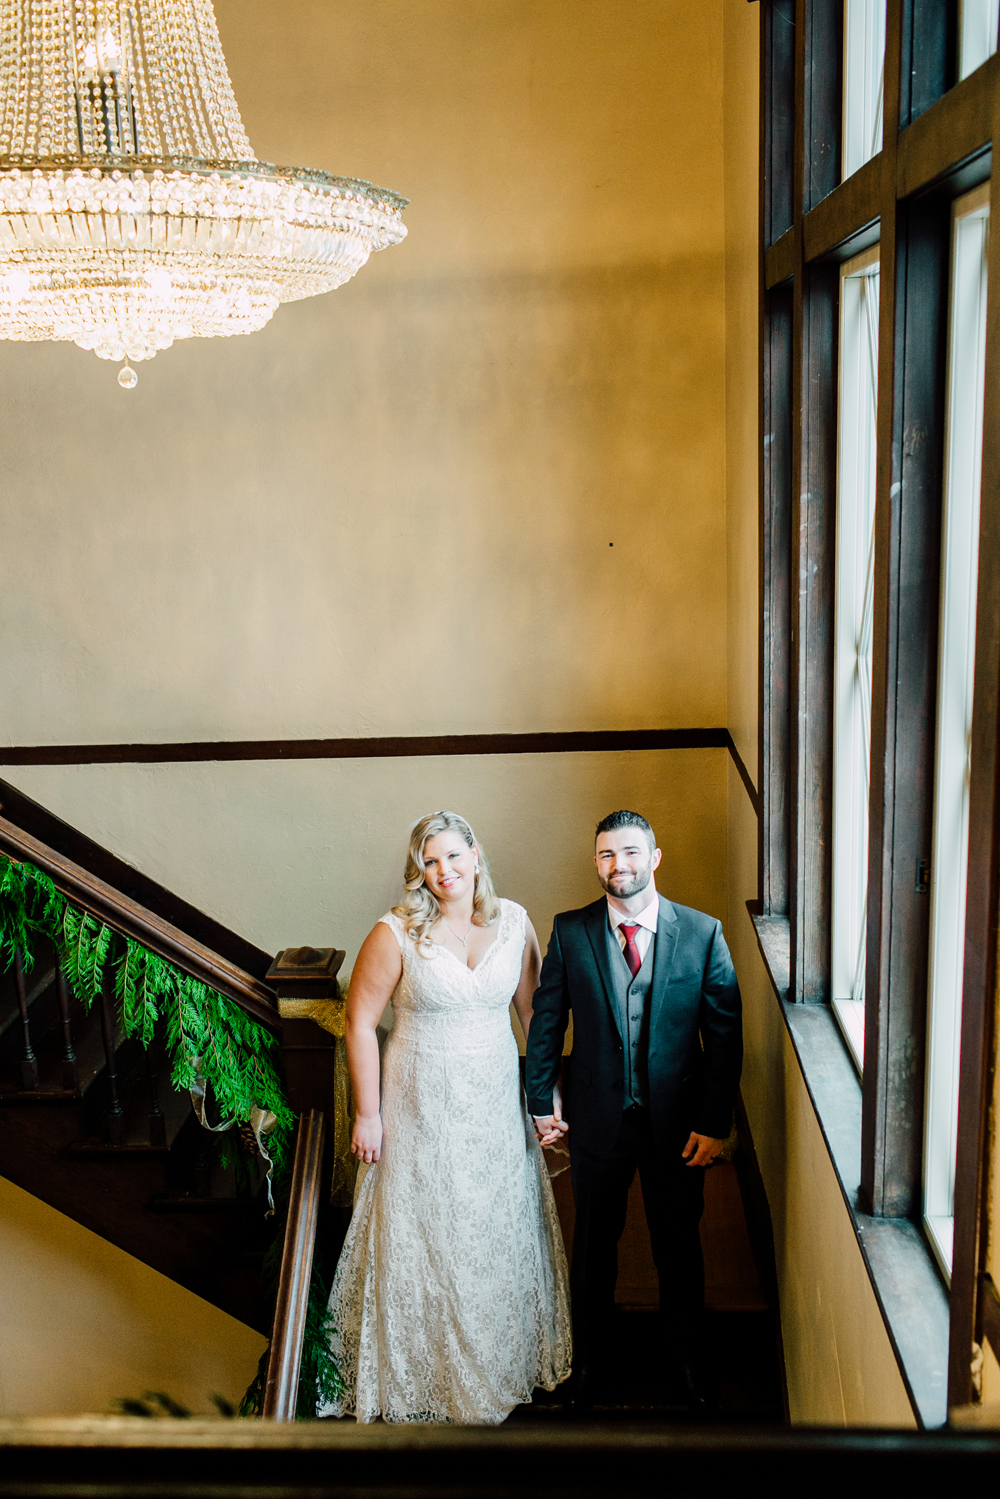 003-bellingham-wedding-photographer-broadway-hall-katheryn-moran-jessie-kyle.jpg